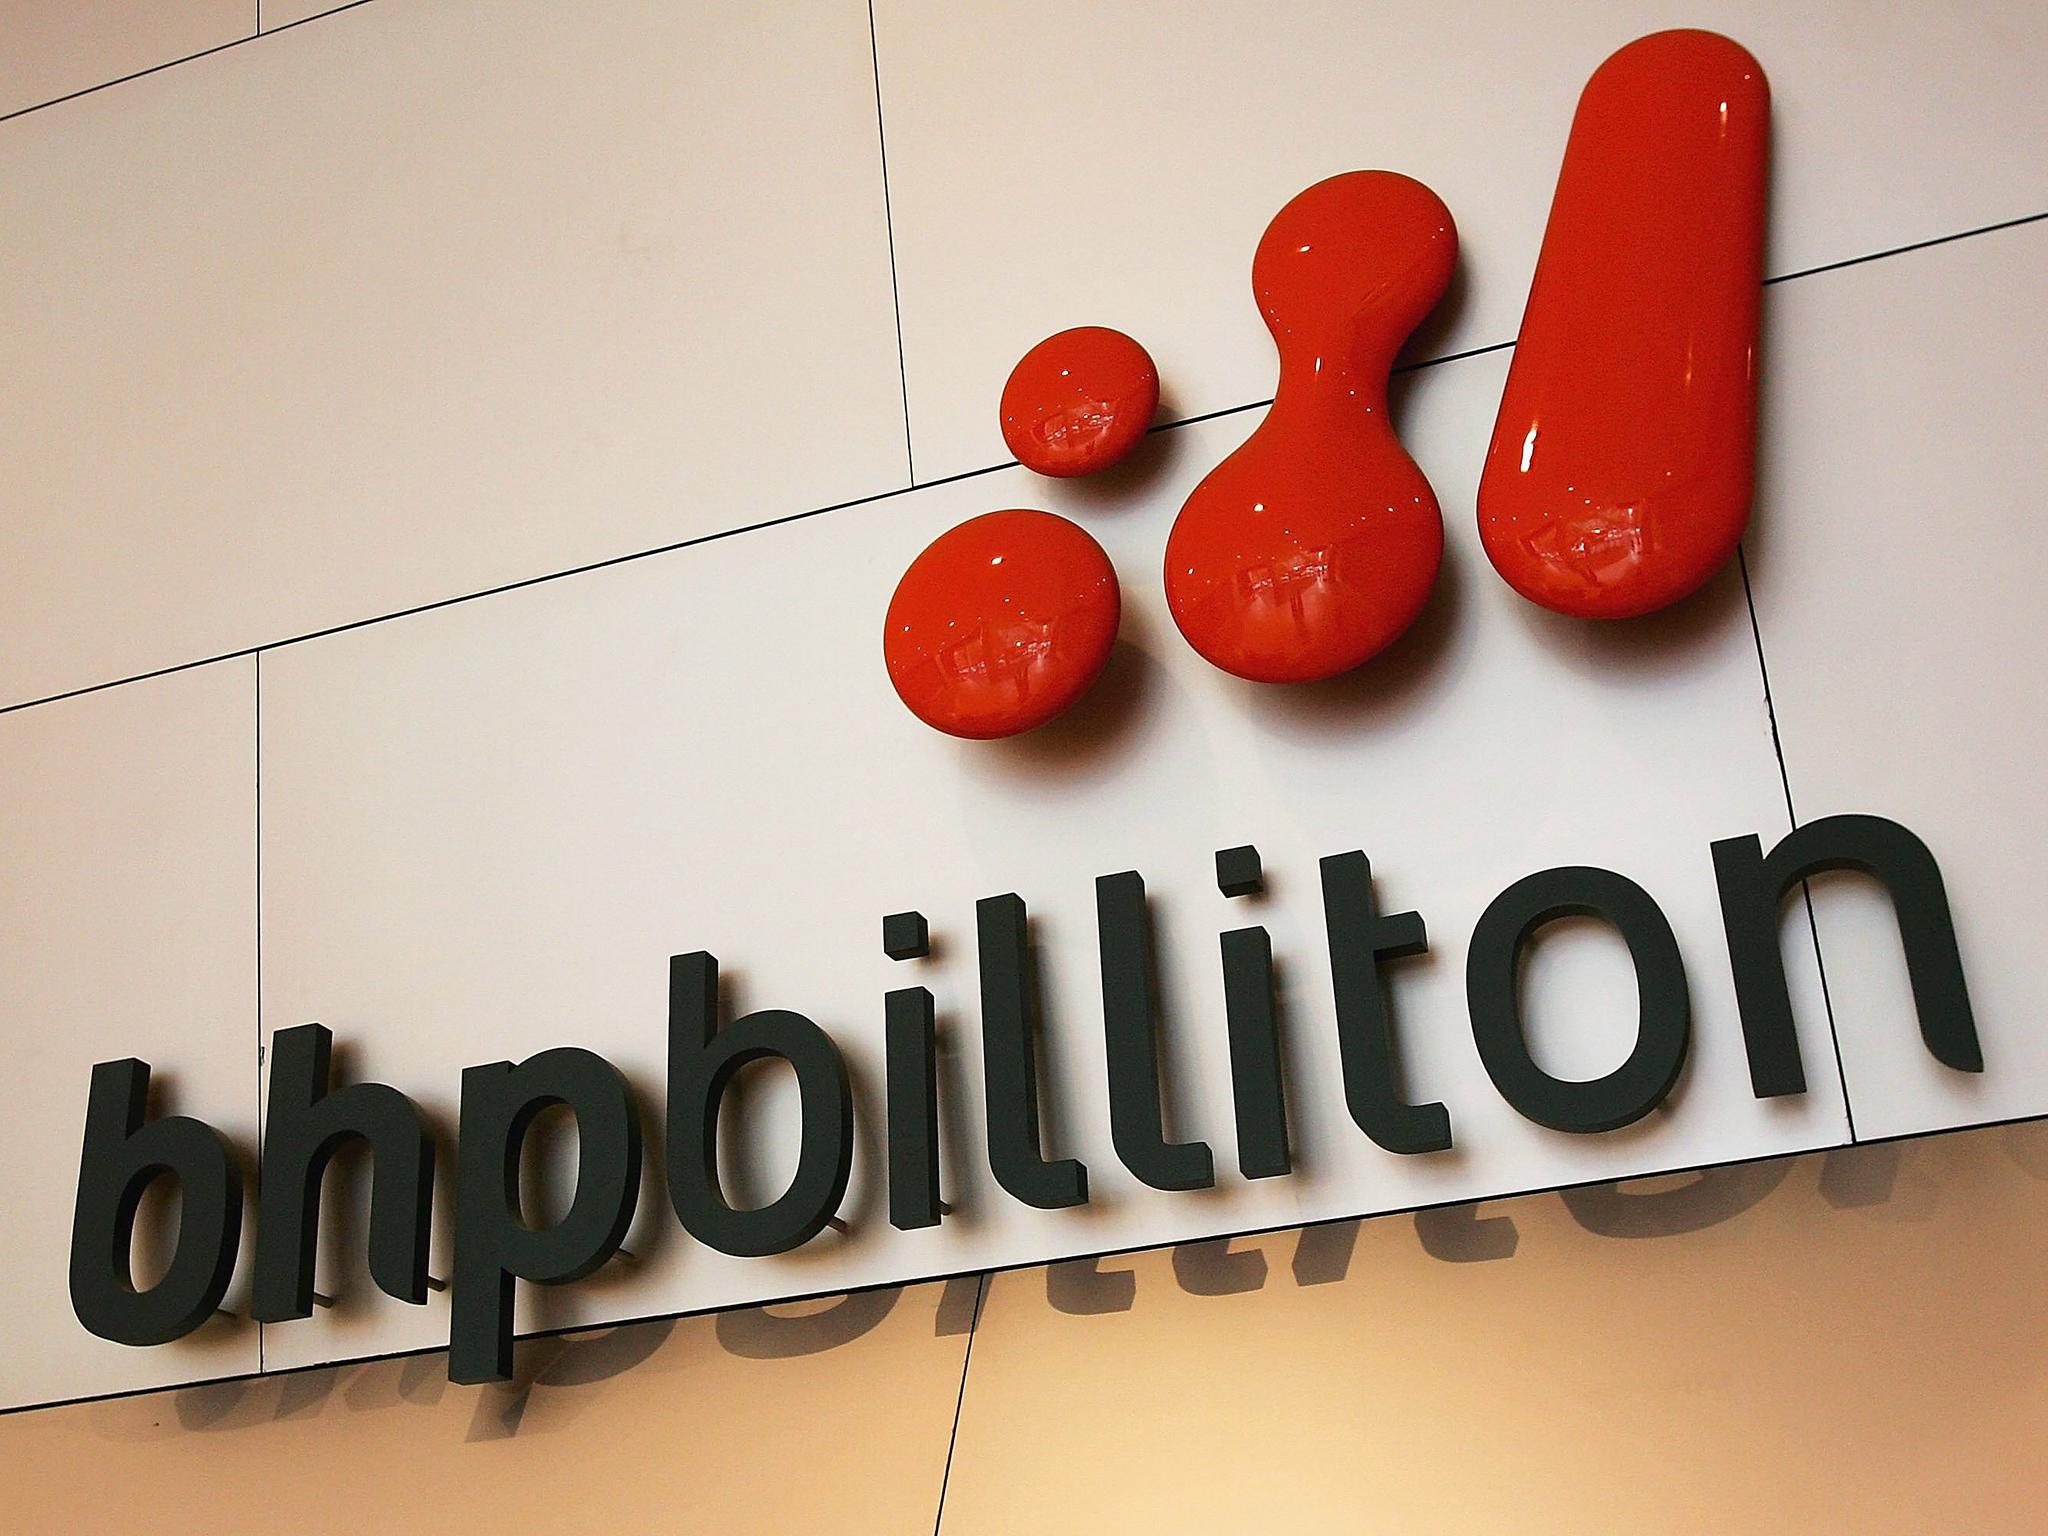 Bhp Billiton Limited Adrnysebhp Needs 10 Billion Funding In